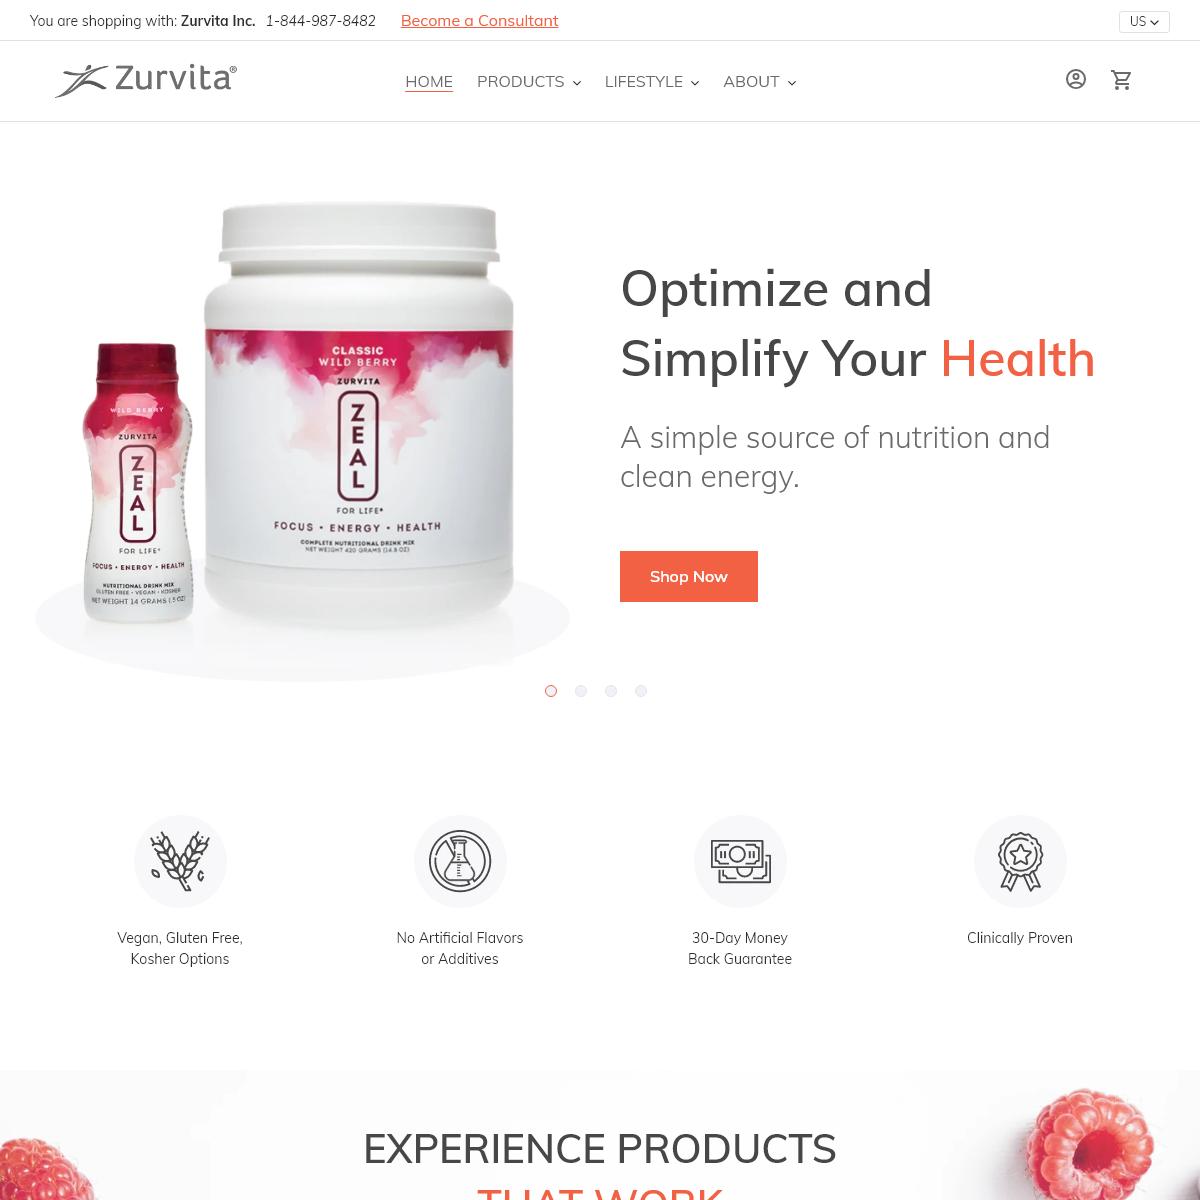 Zurvita, a Health and Wellness Direct Sales Company – Zurvita Holdings Inc.